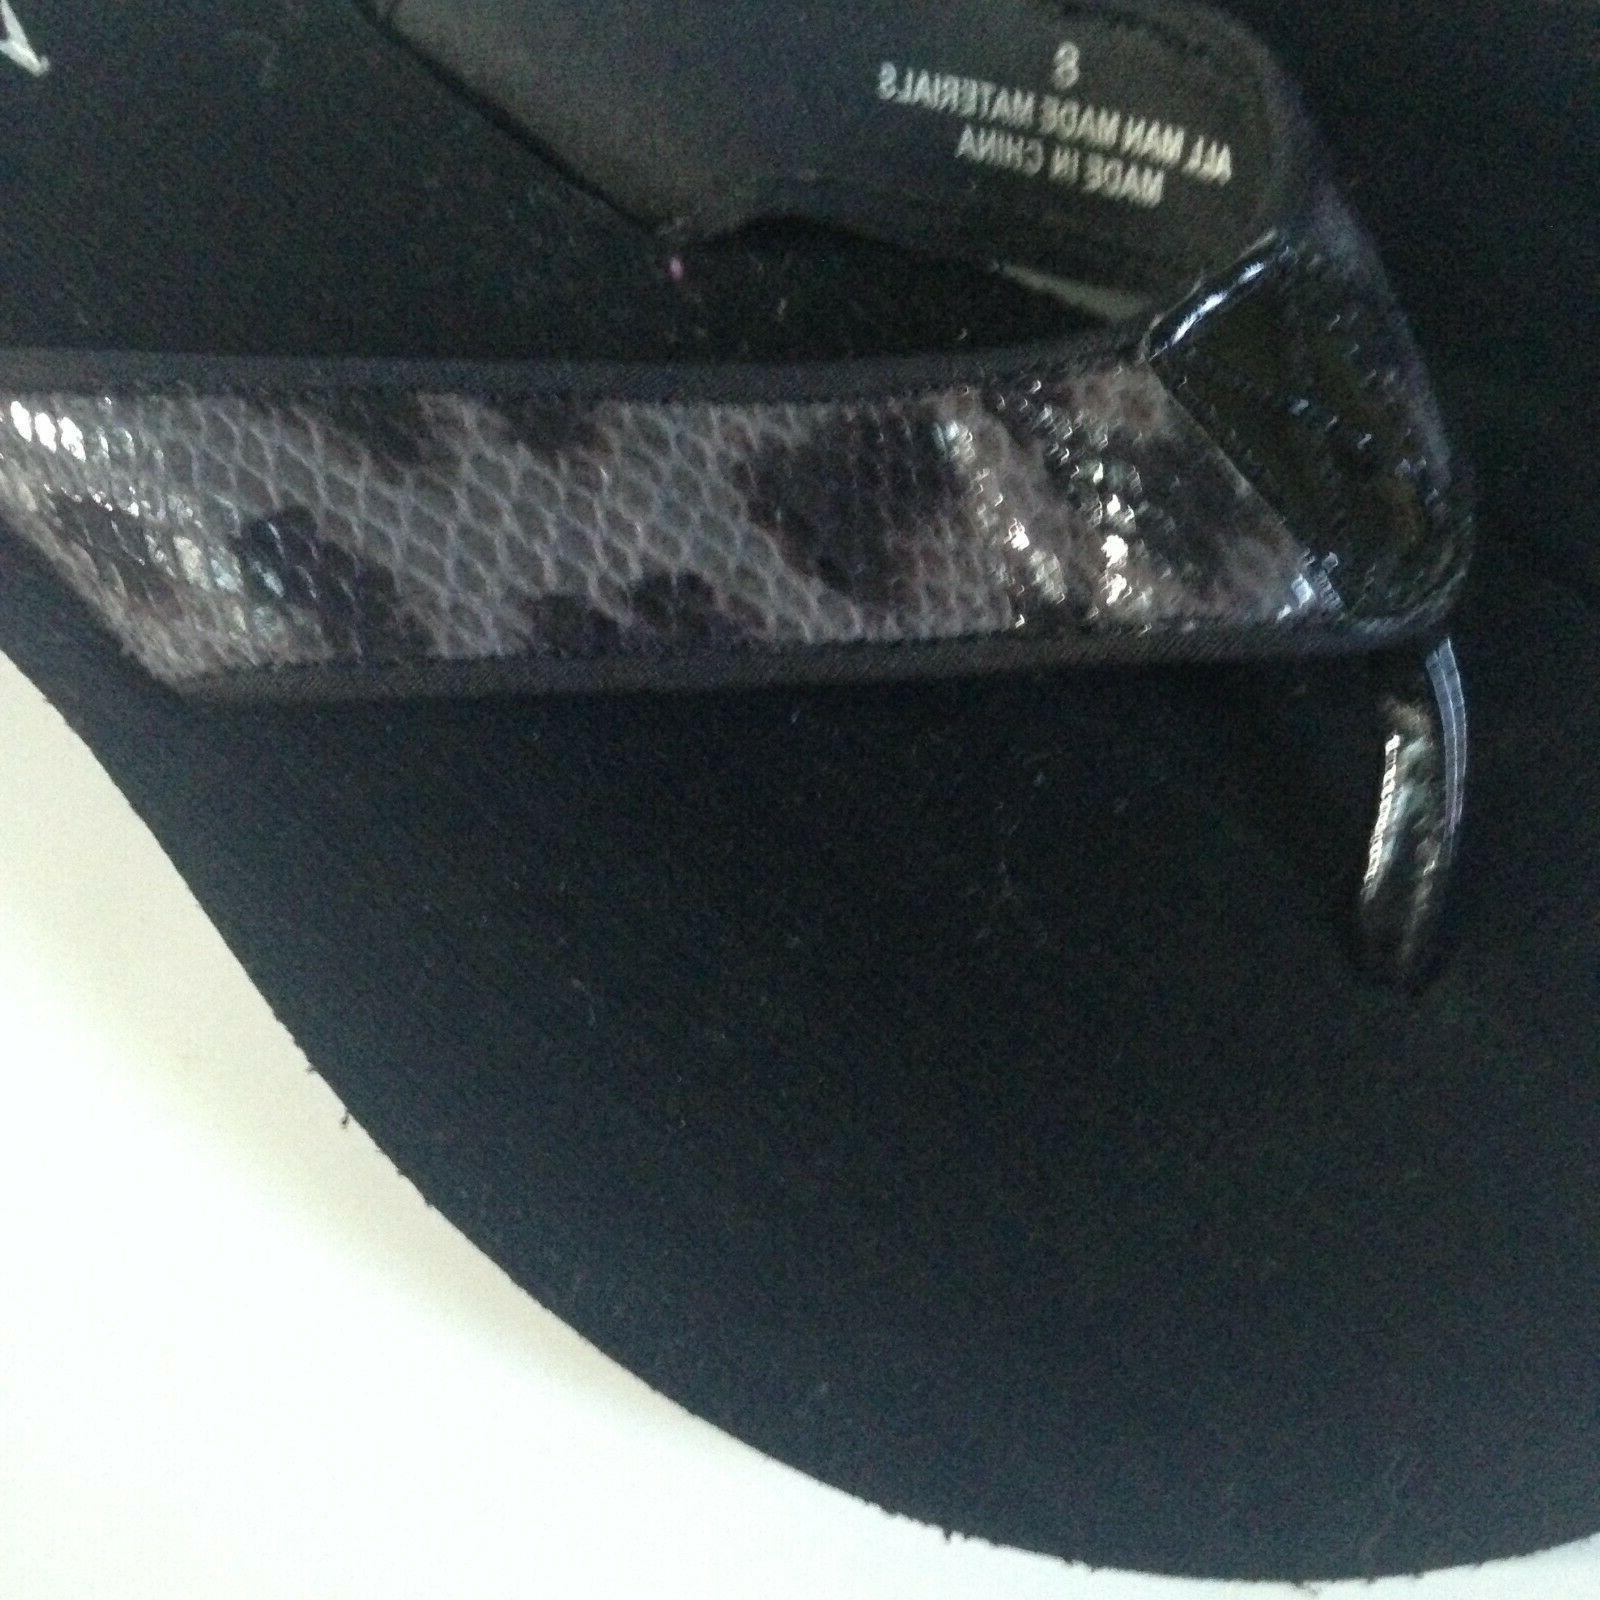 NEW! Flops Women's Size 8 Black Faux Rubber